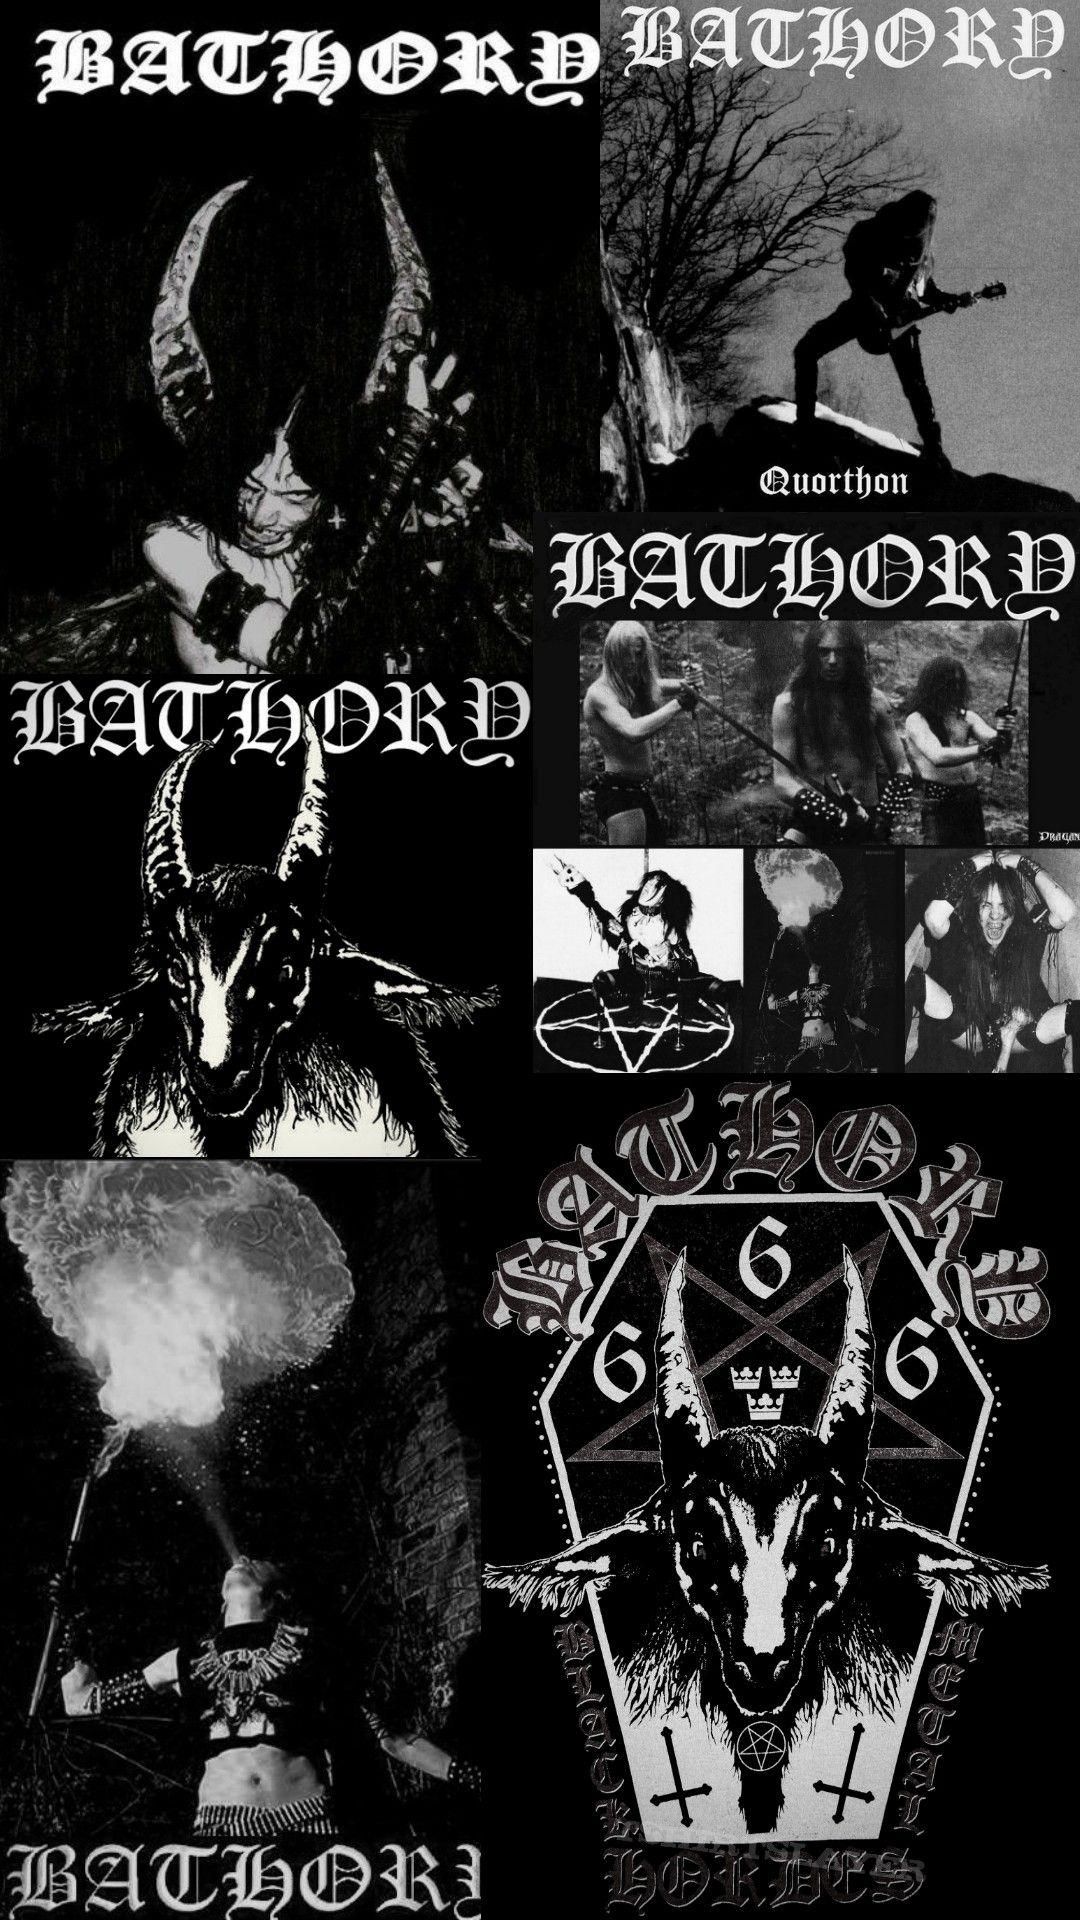 Bathory Wallpaper Goth Wallpaper Black Metal Art Edgy Wallpaper